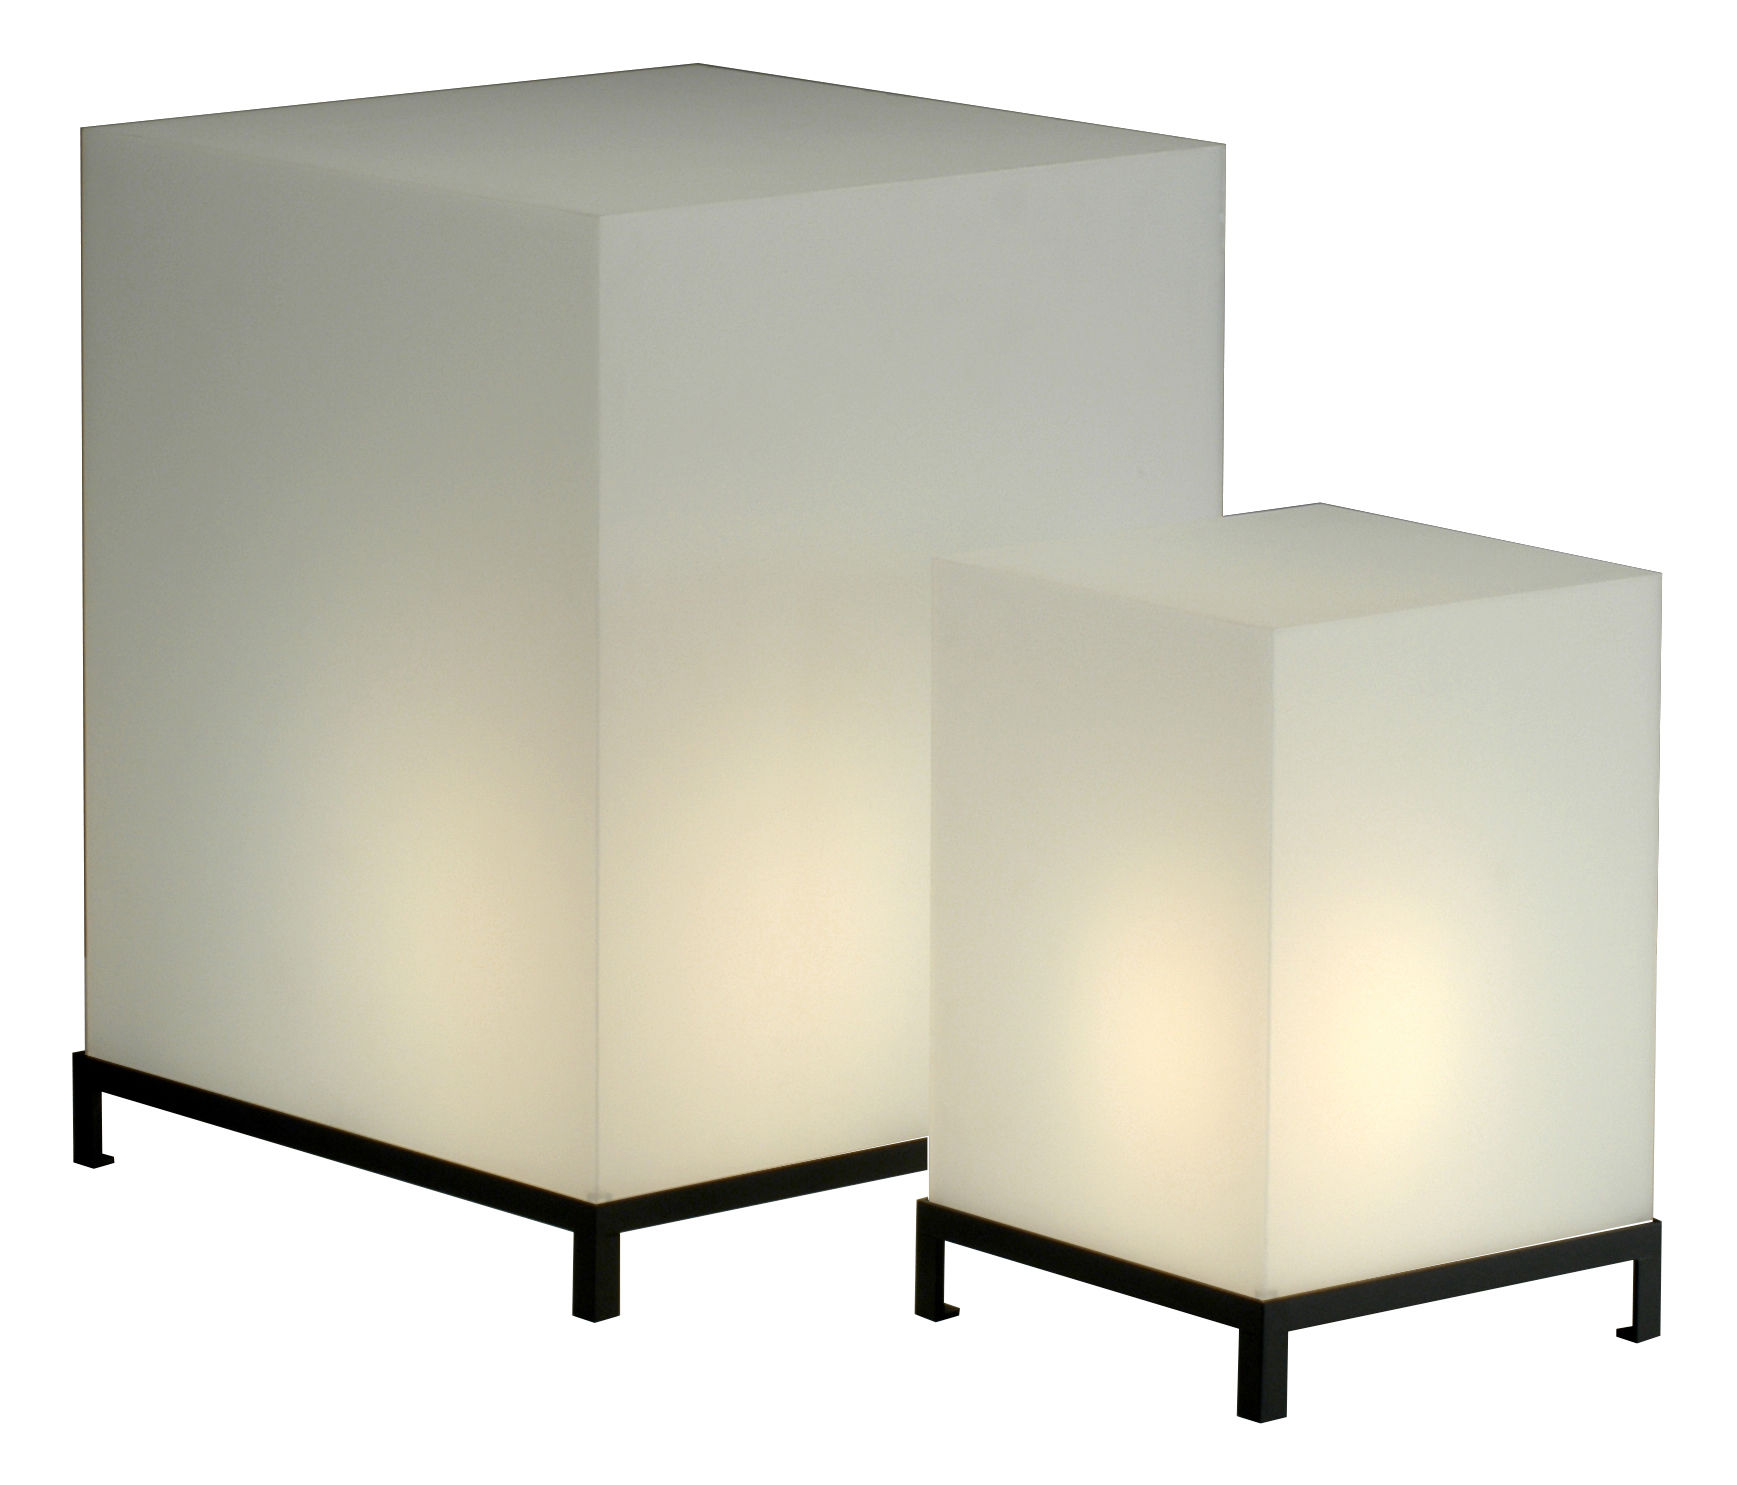 lampe de sol star cube blanc h 65 cm zeus. Black Bedroom Furniture Sets. Home Design Ideas